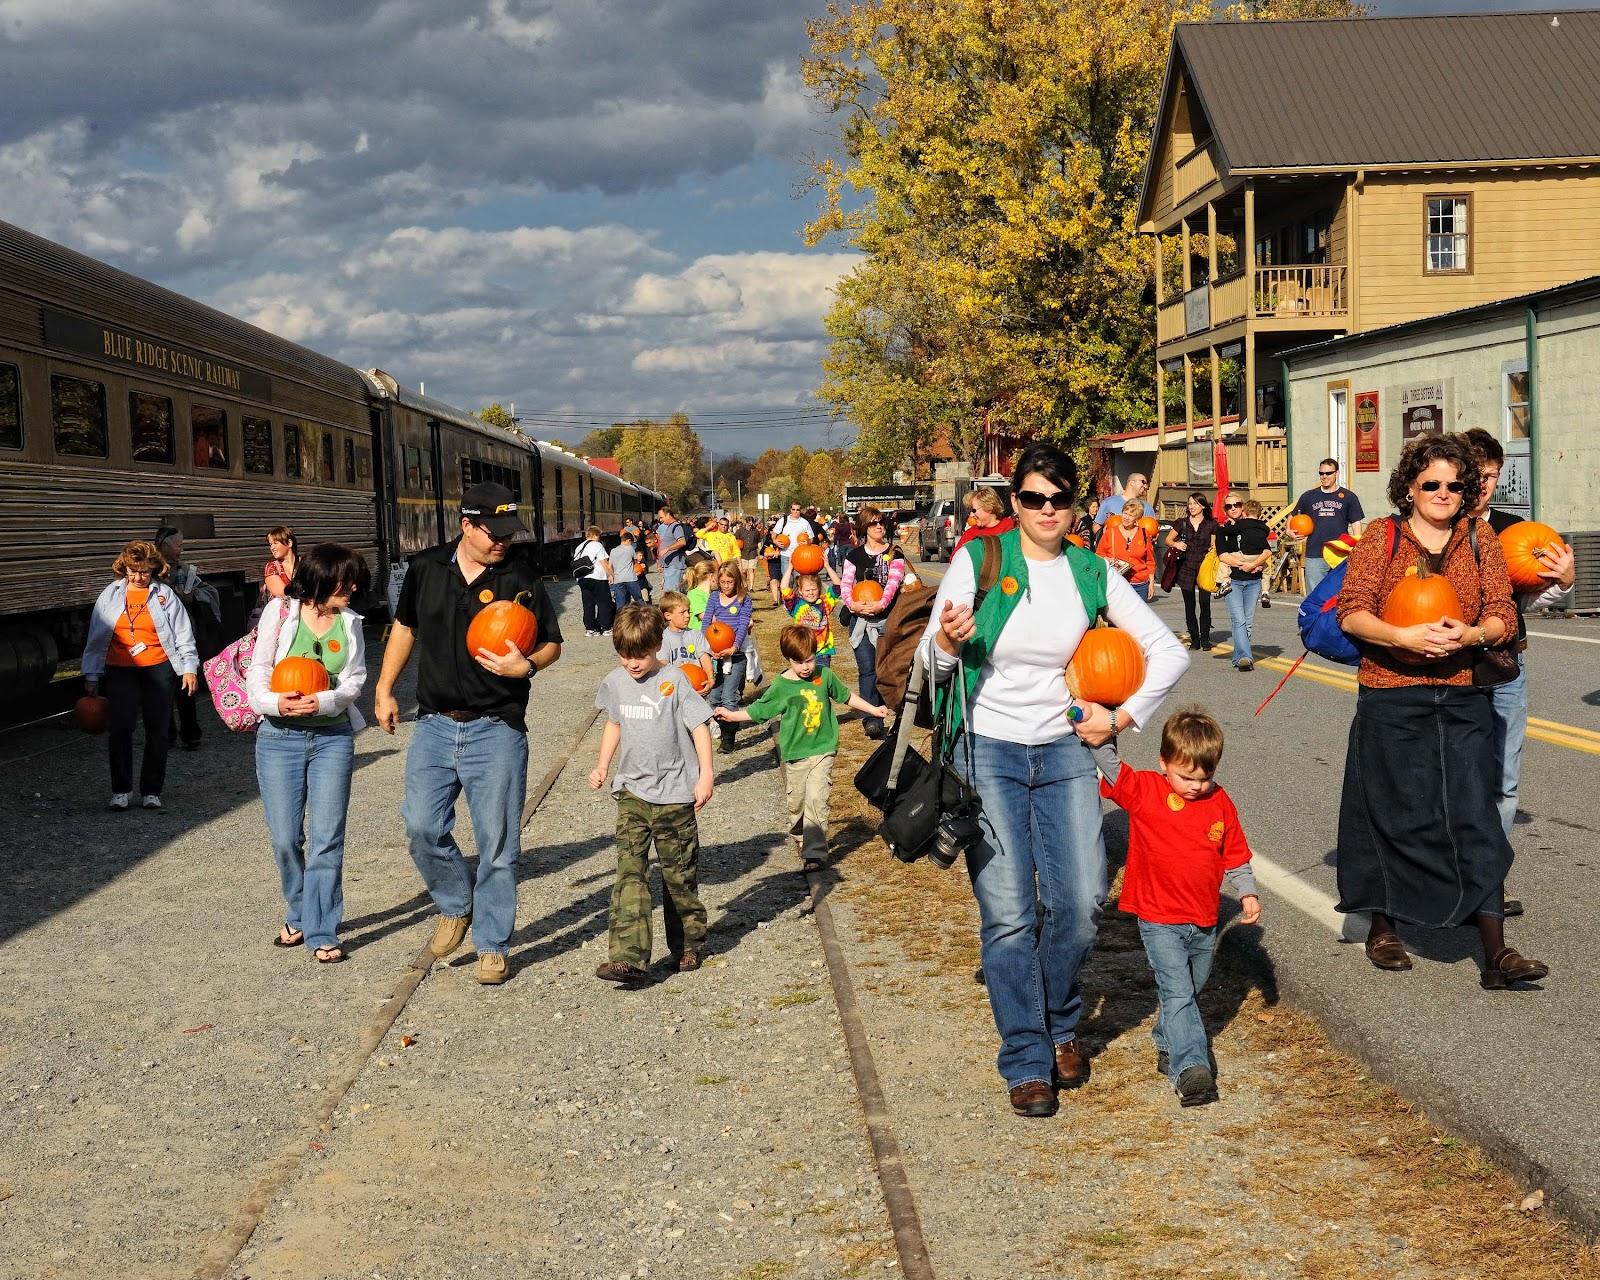 Celebrate Halloween In Blue Ridge